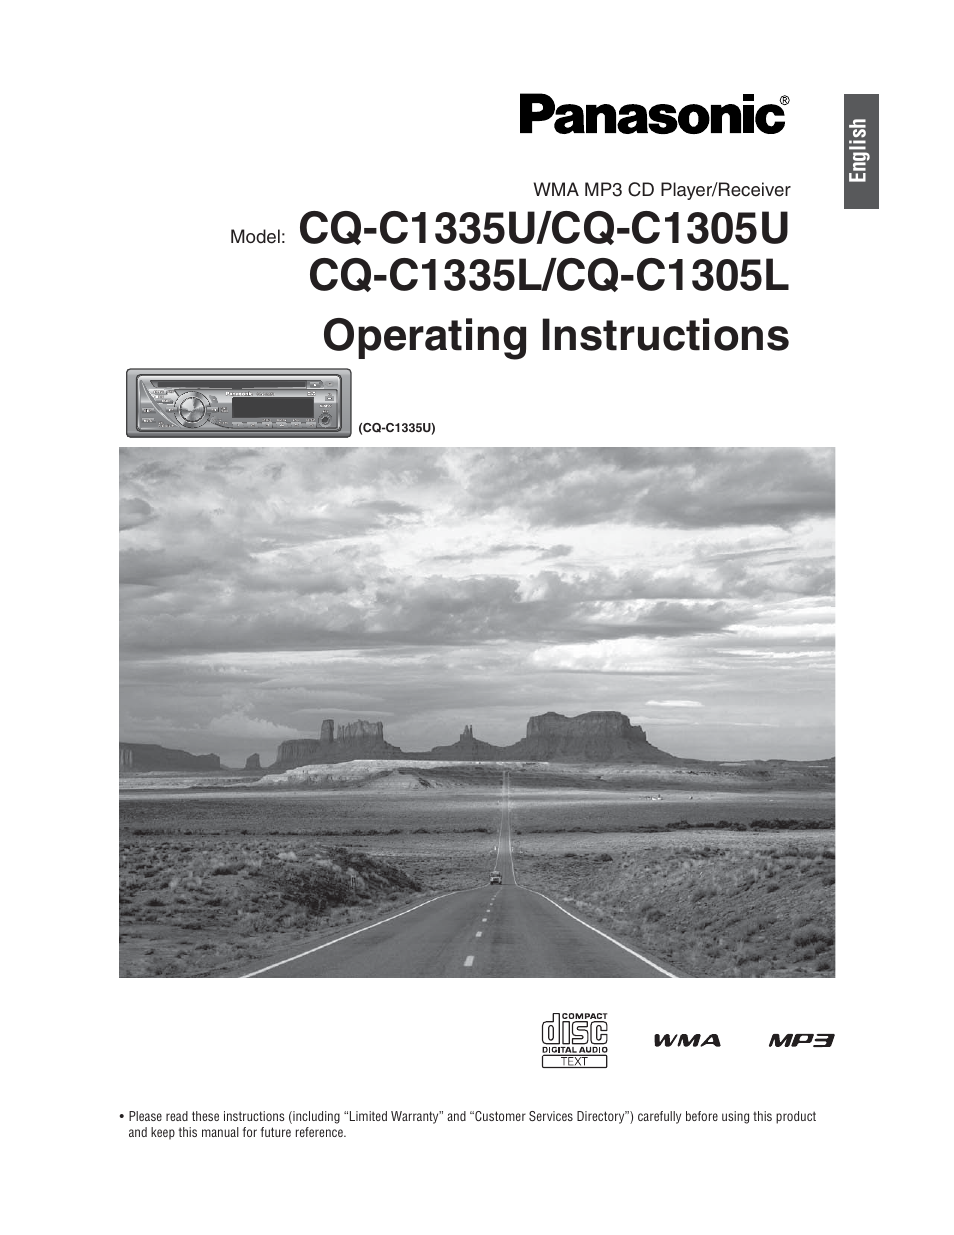 Panasonic CQ-C1305L User Manual   24 pages   Also for: CQ-C1335L, CQ-C1305U,  CQ-C1335U